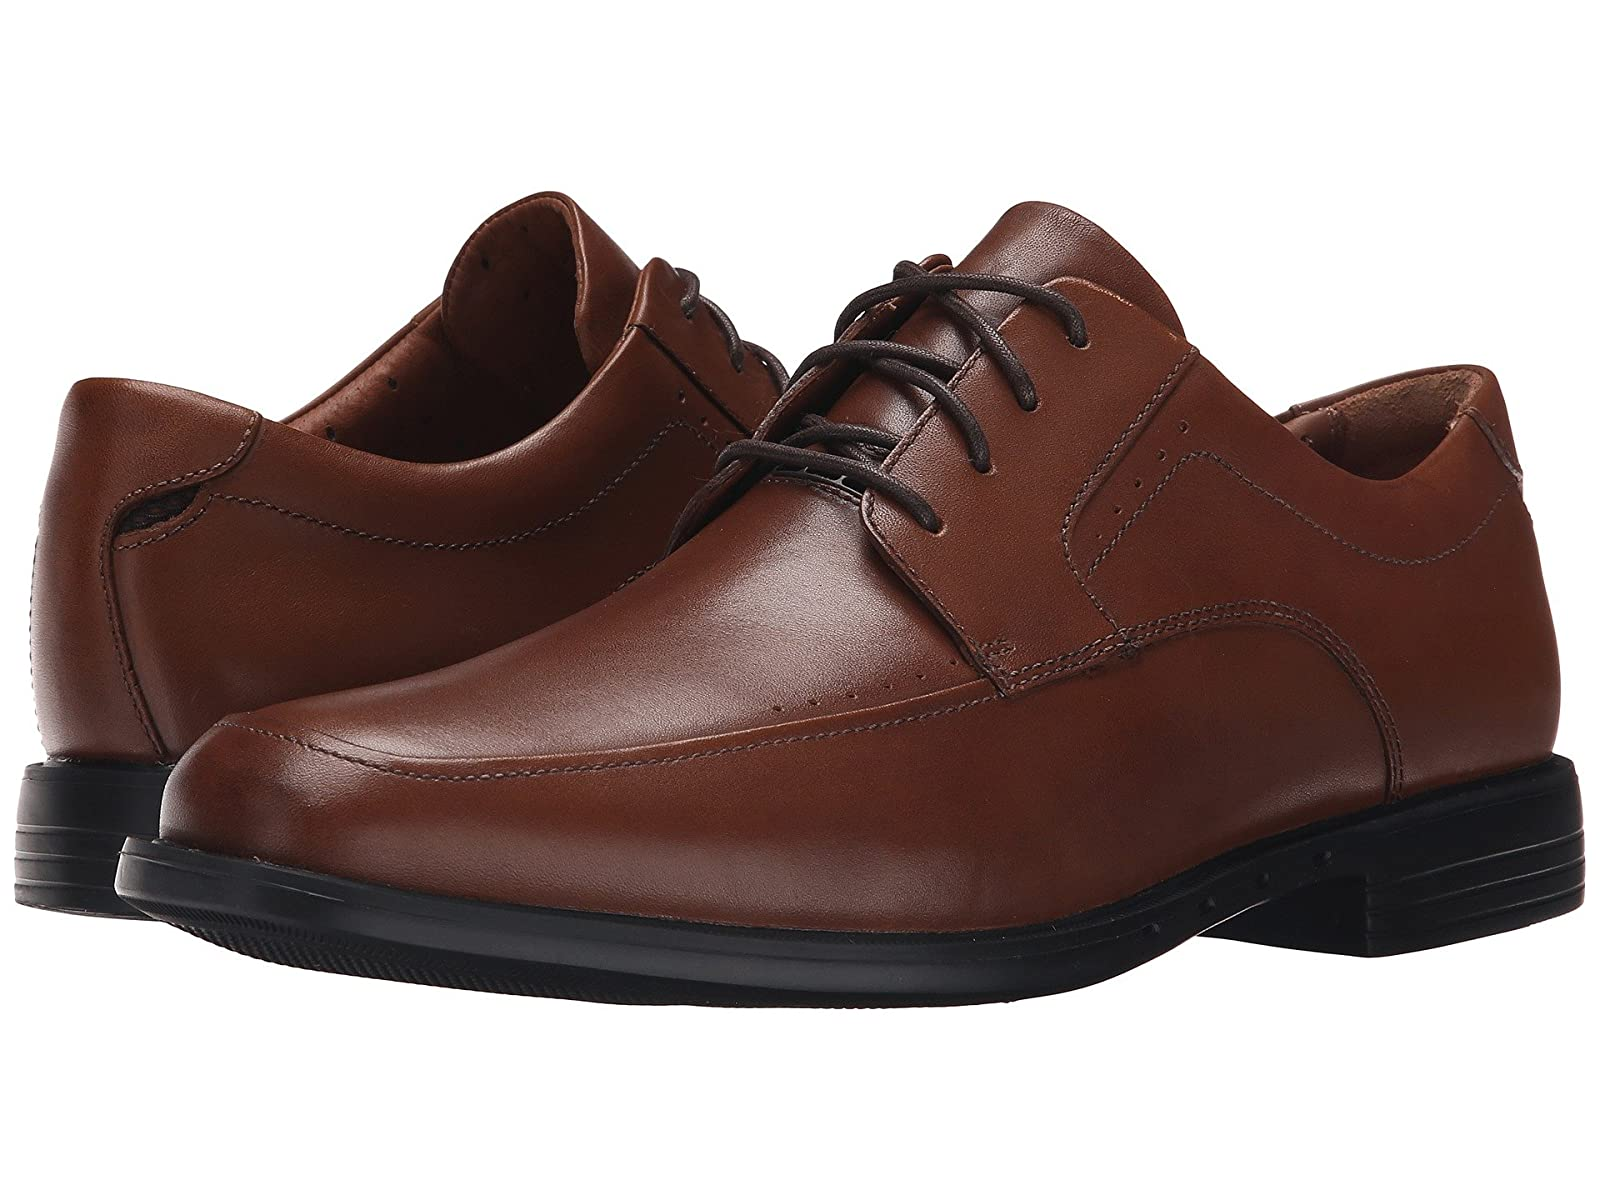 Clarks Un.Bizley ViewCheap and distinctive eye-catching shoes